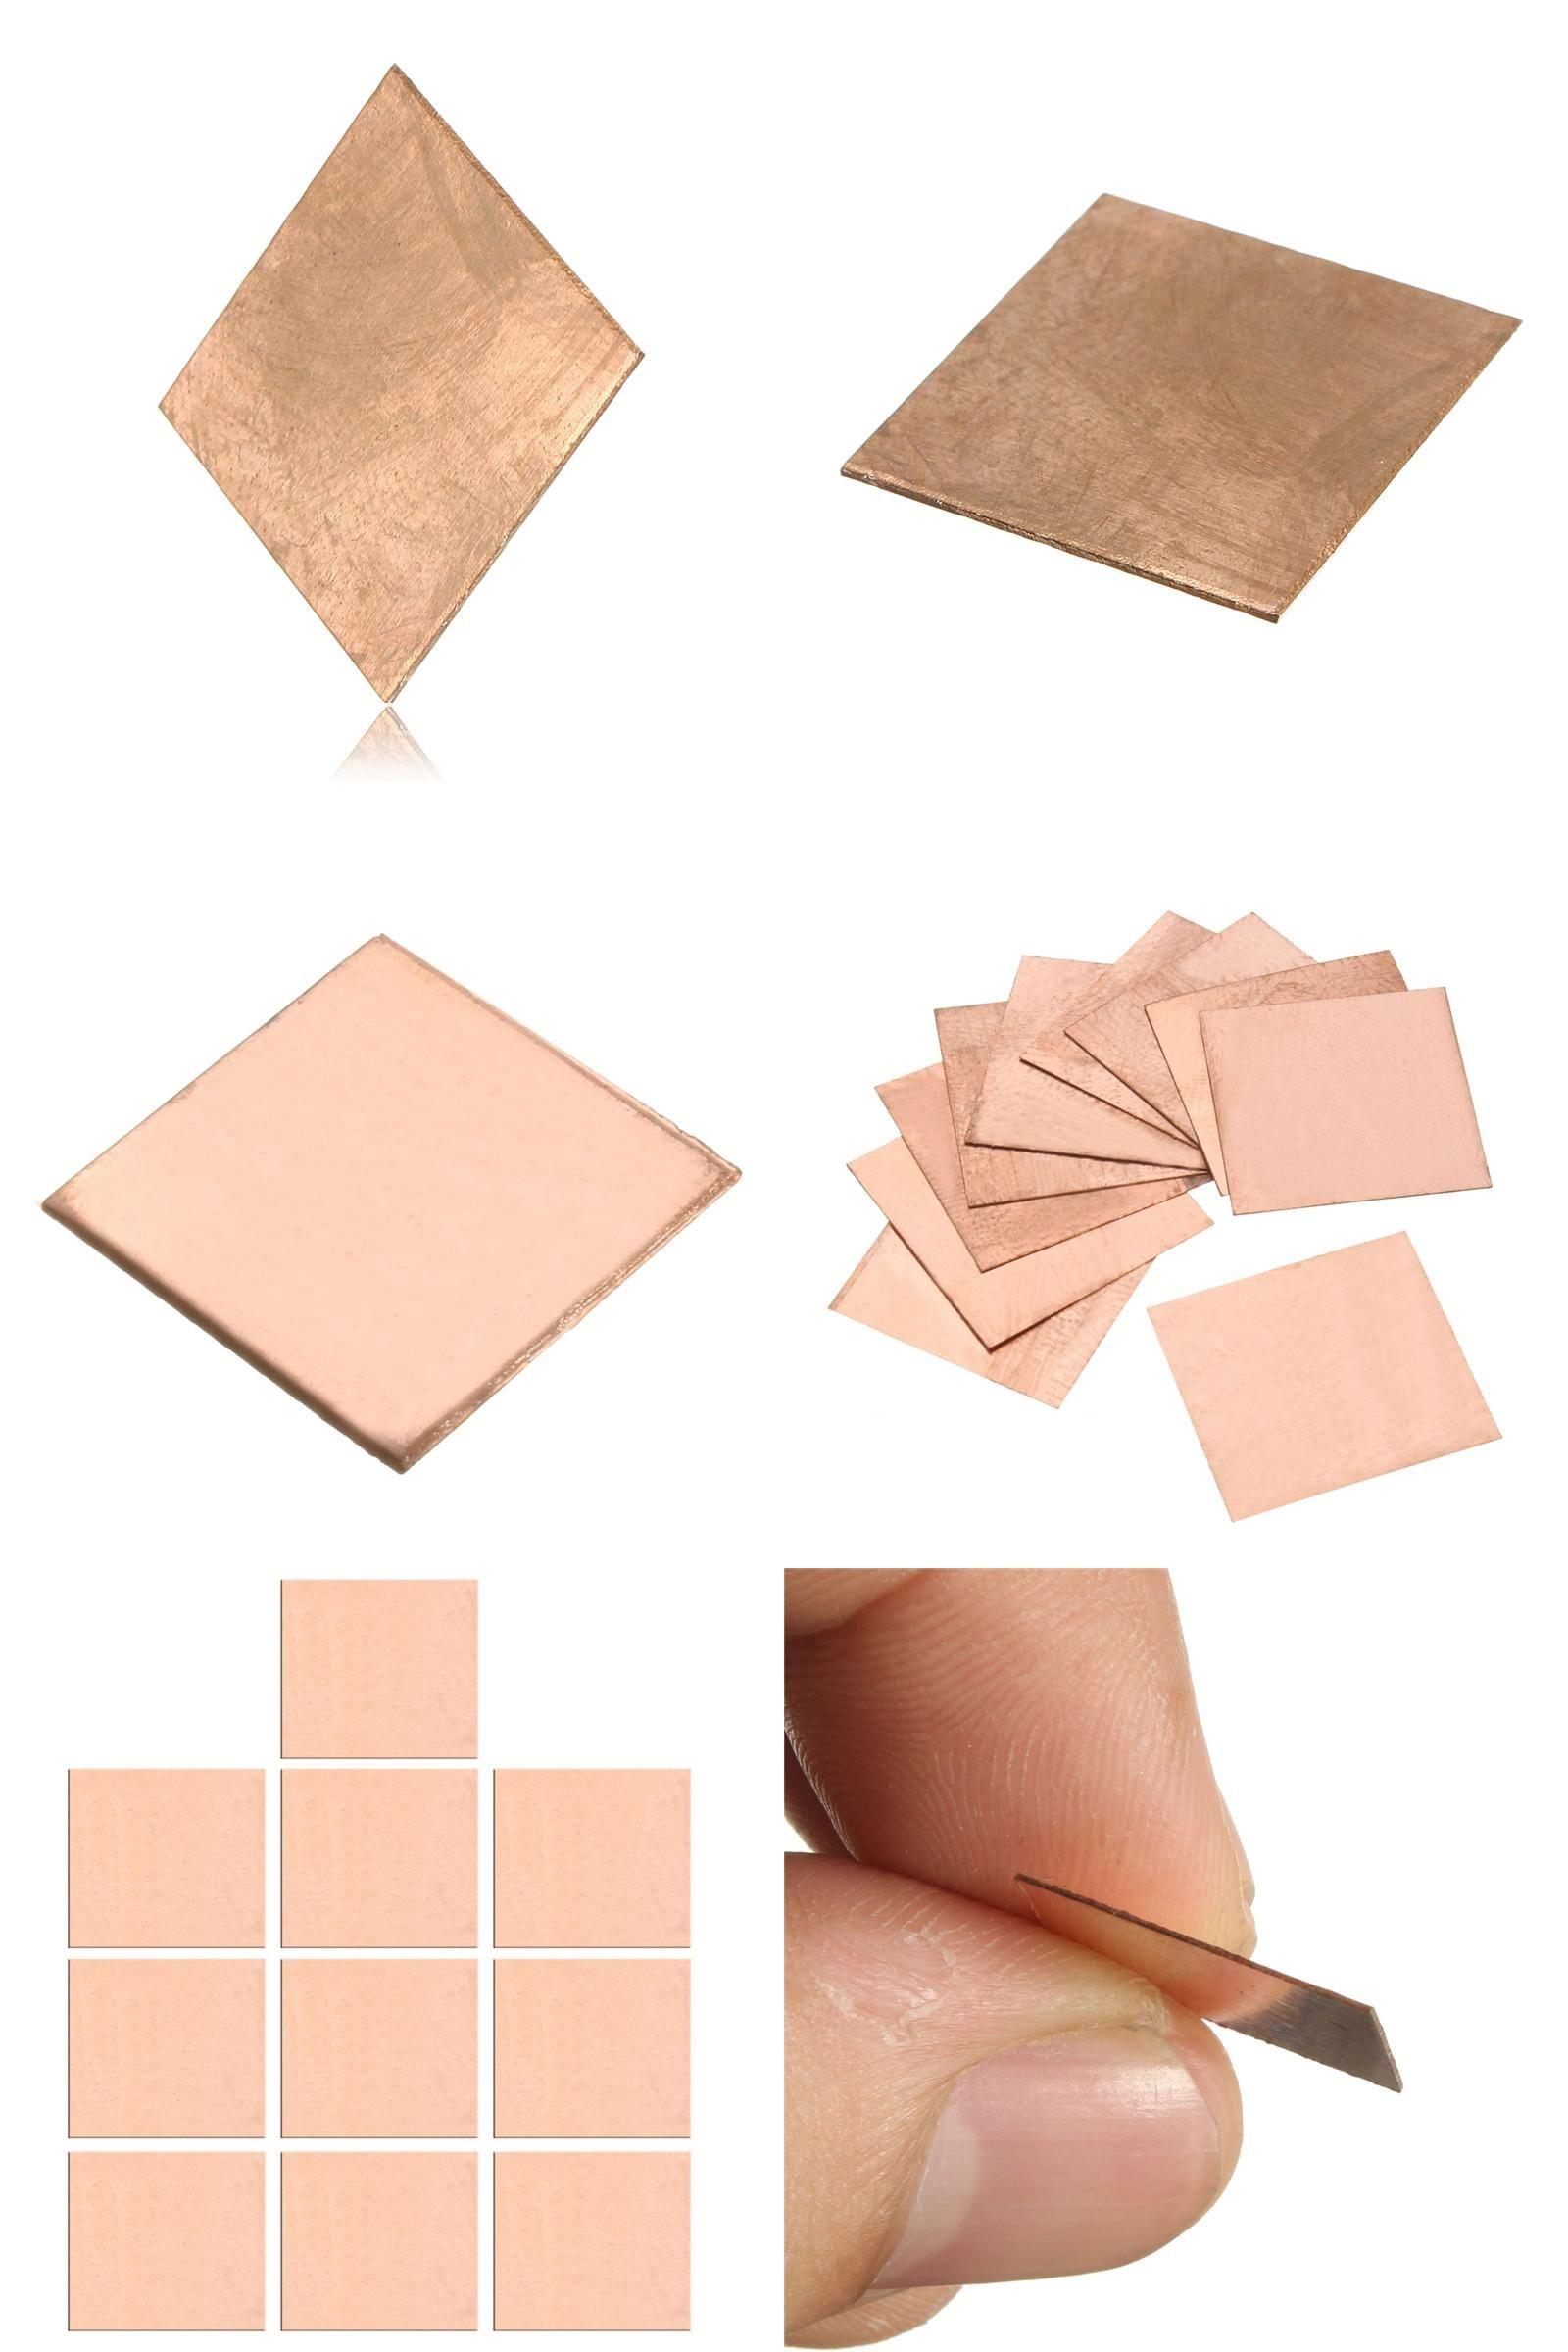 Visit To Buy 10pcs Laptop Copper Sheet Plate Strip Shim Thermal Pad Heatsink Sheet 0 1mm 0 3mm 0 5mm 0 8mm For Gpu Cpu Vga Chip Ra Copper Sheets Heatsink Vga